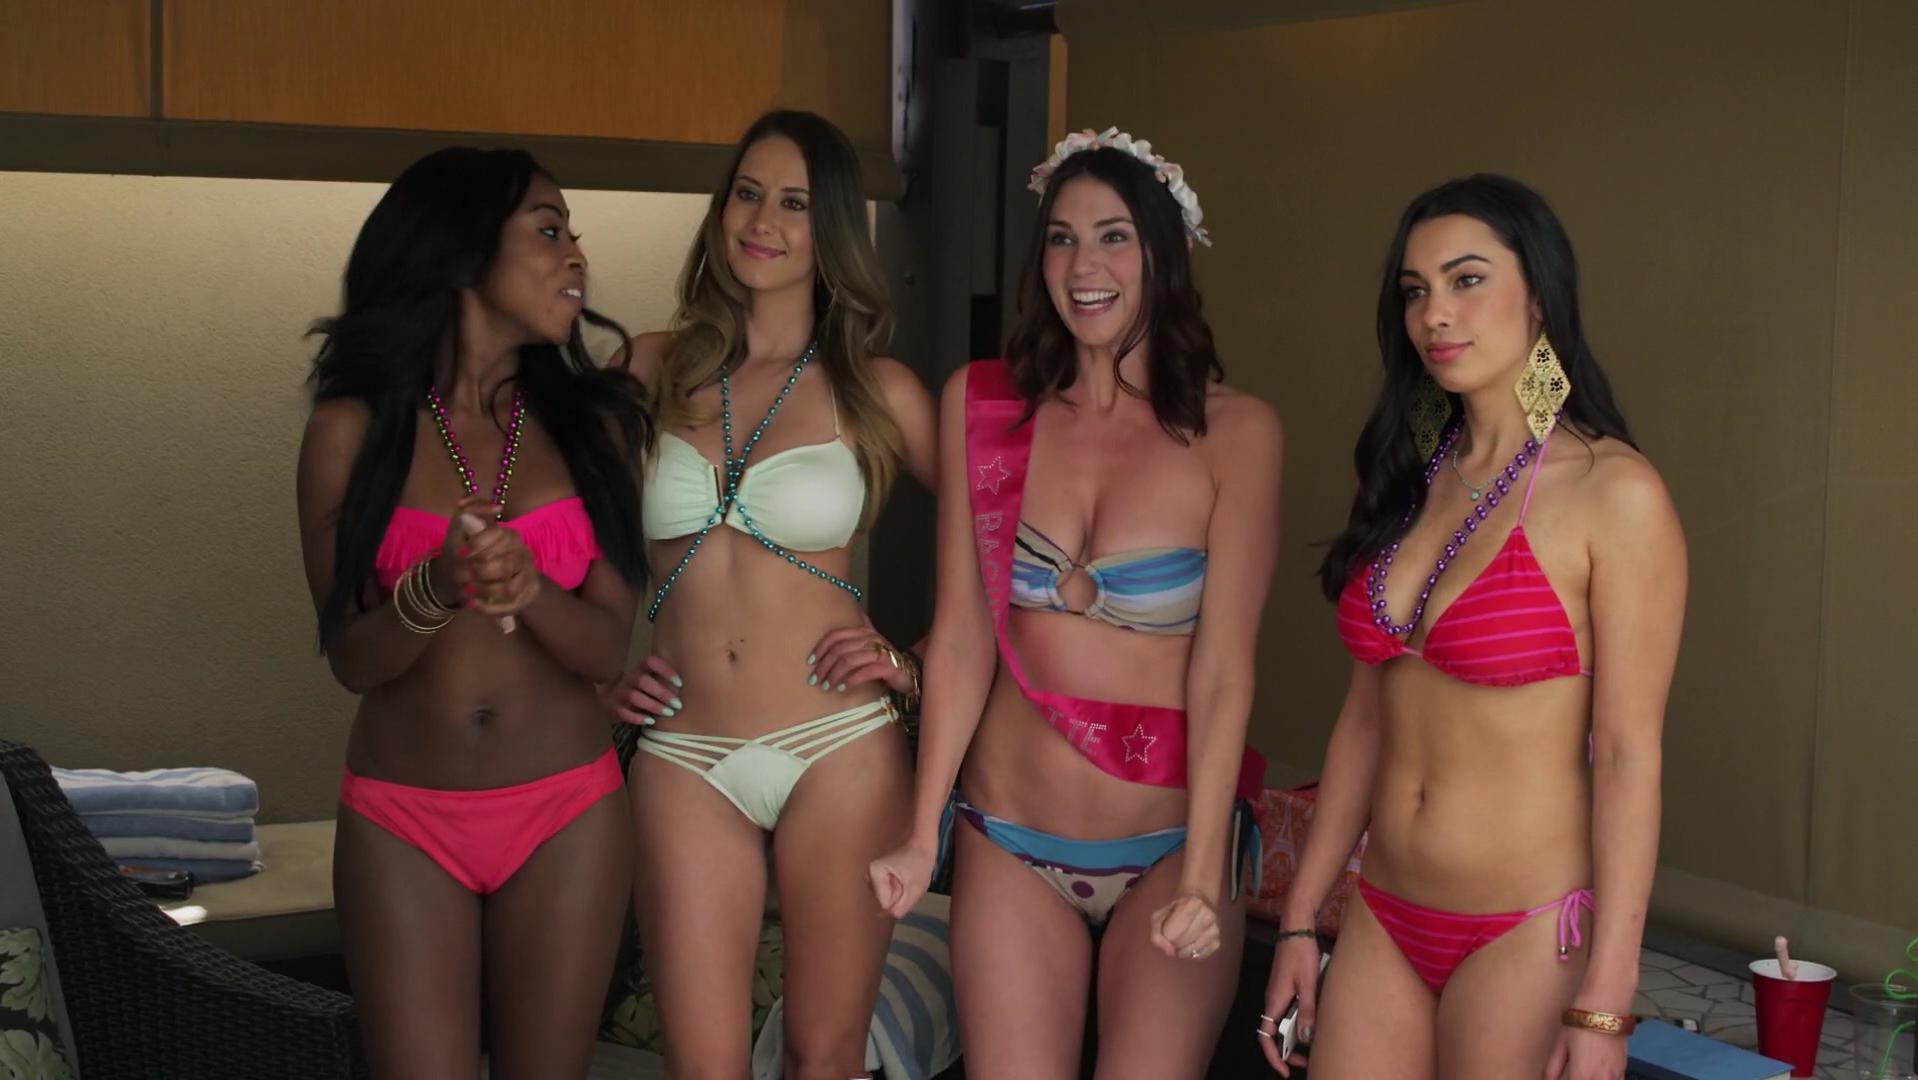 Samantha Stewart nude - Bachelor Night (2014)